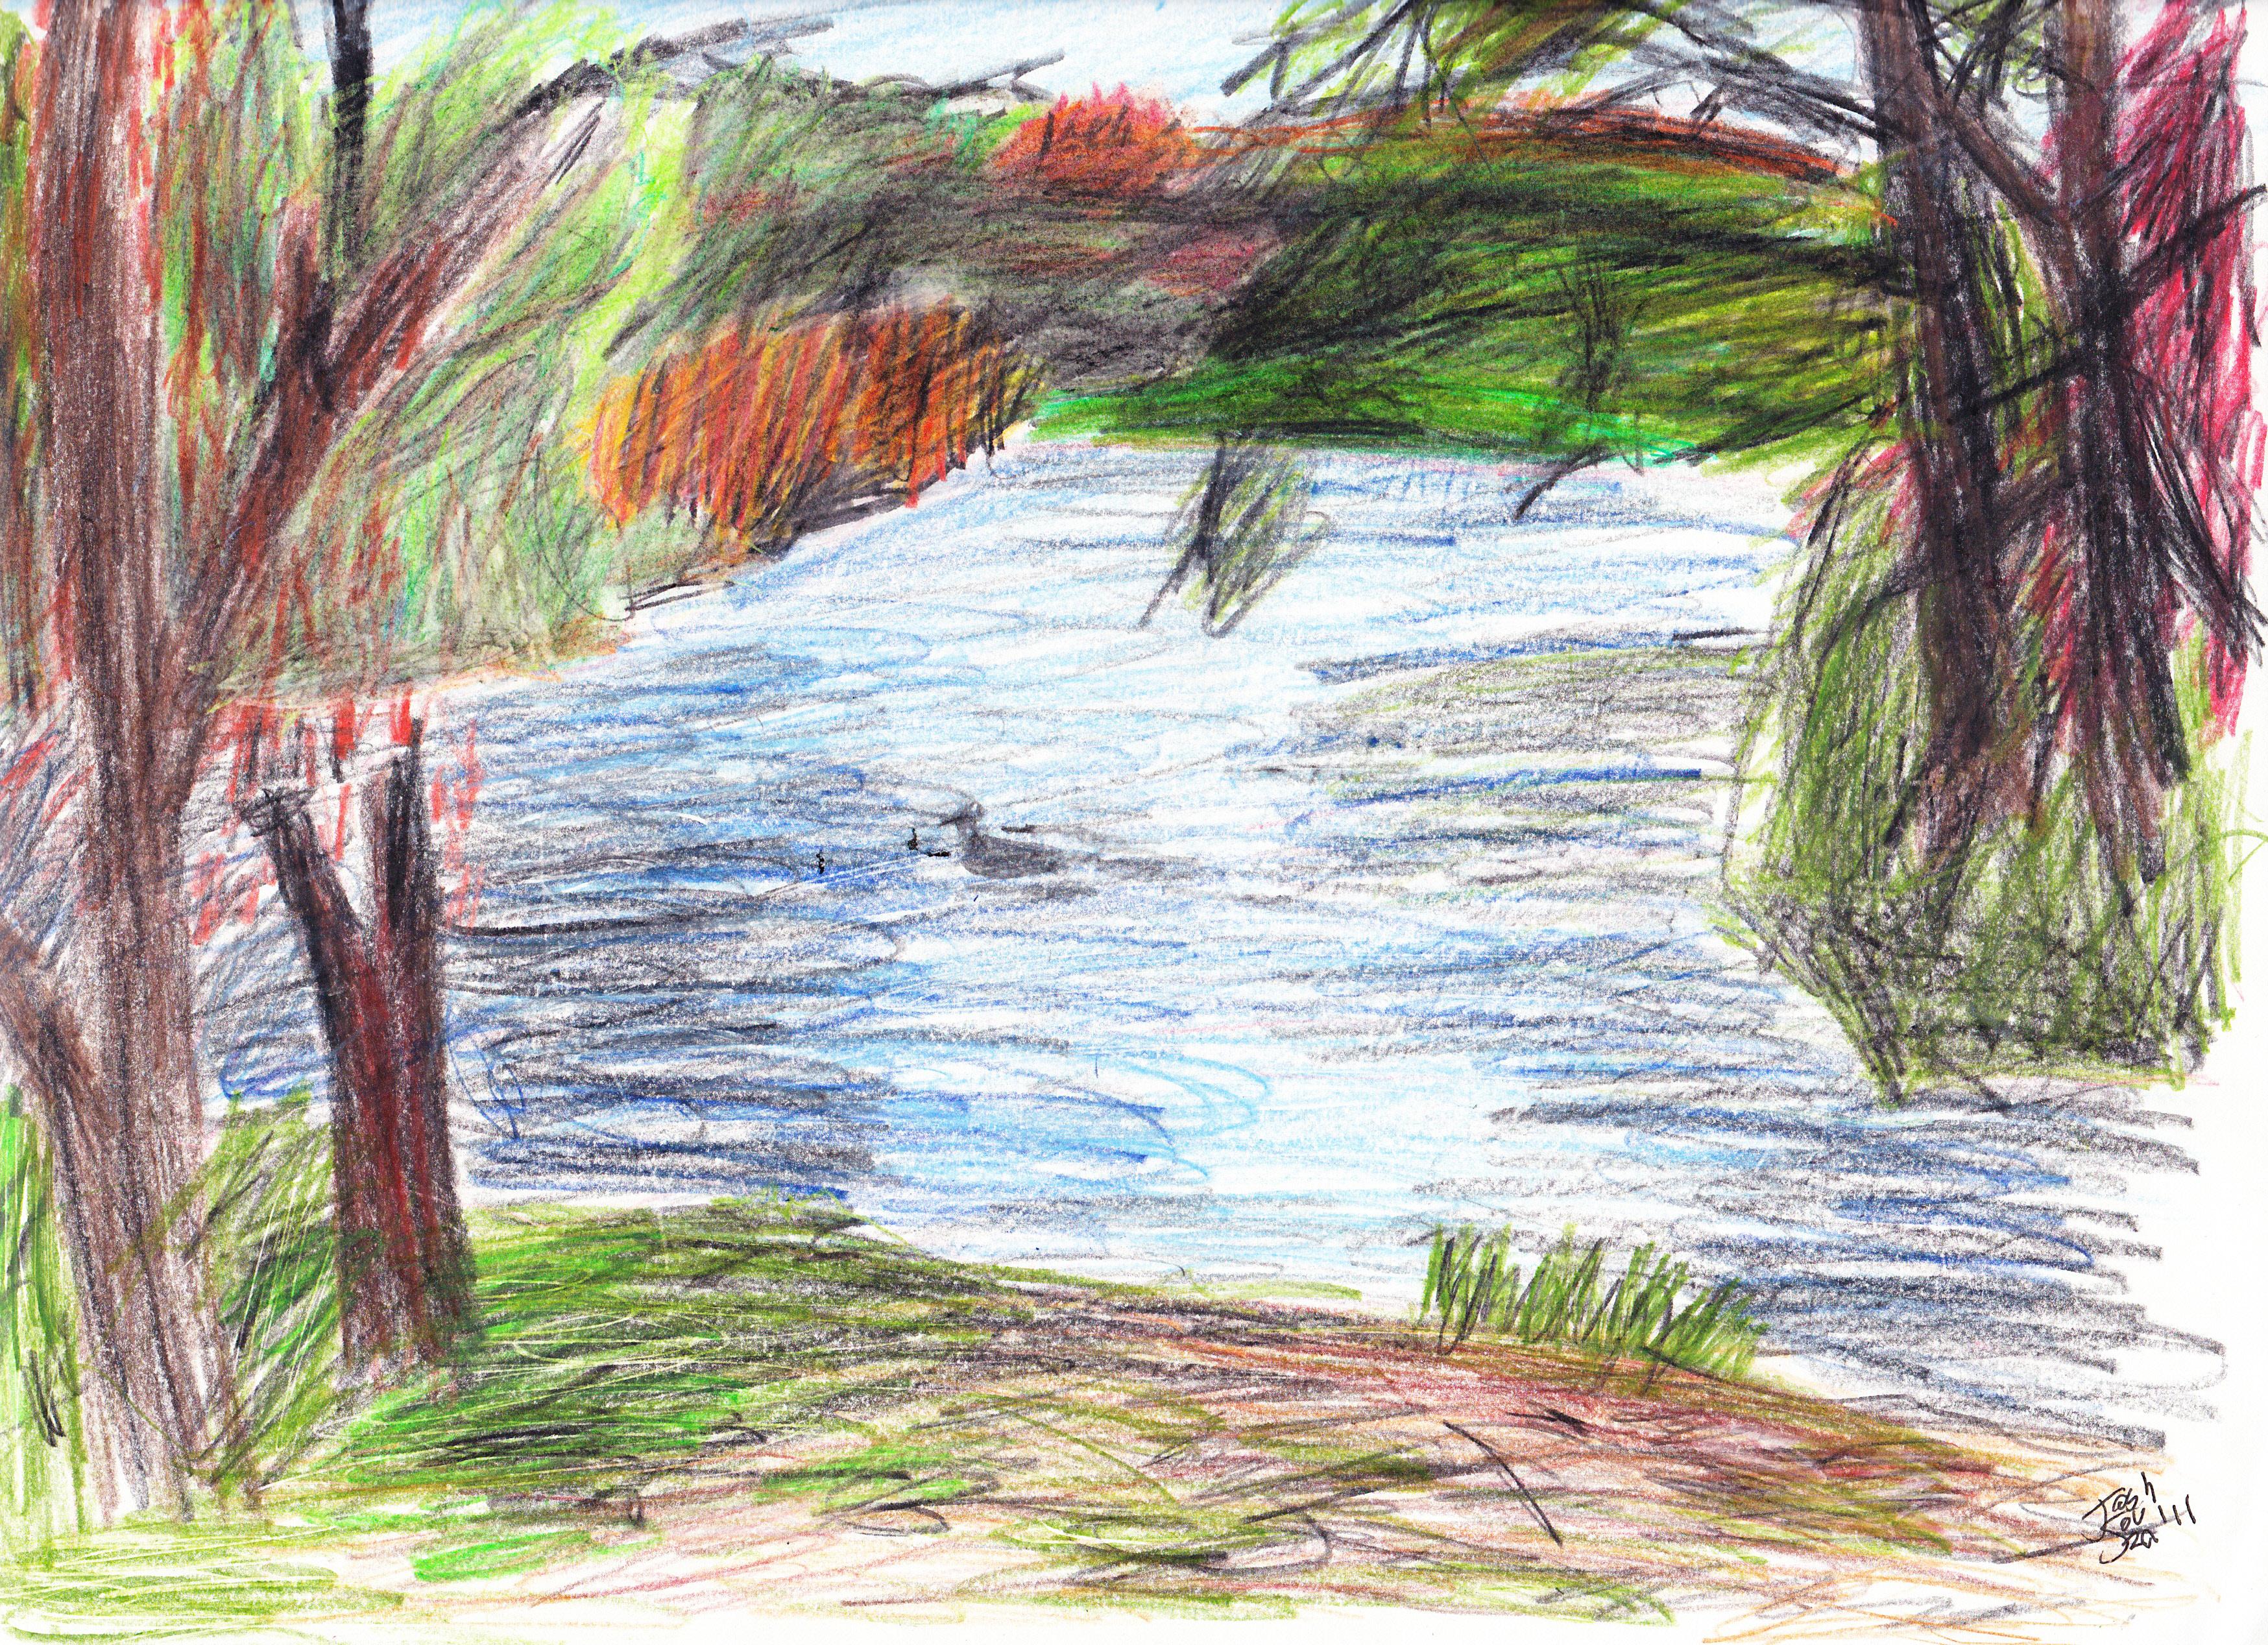 Drawn scenery colored pencil Landscape Pics Pencil Drawings: Landscapes